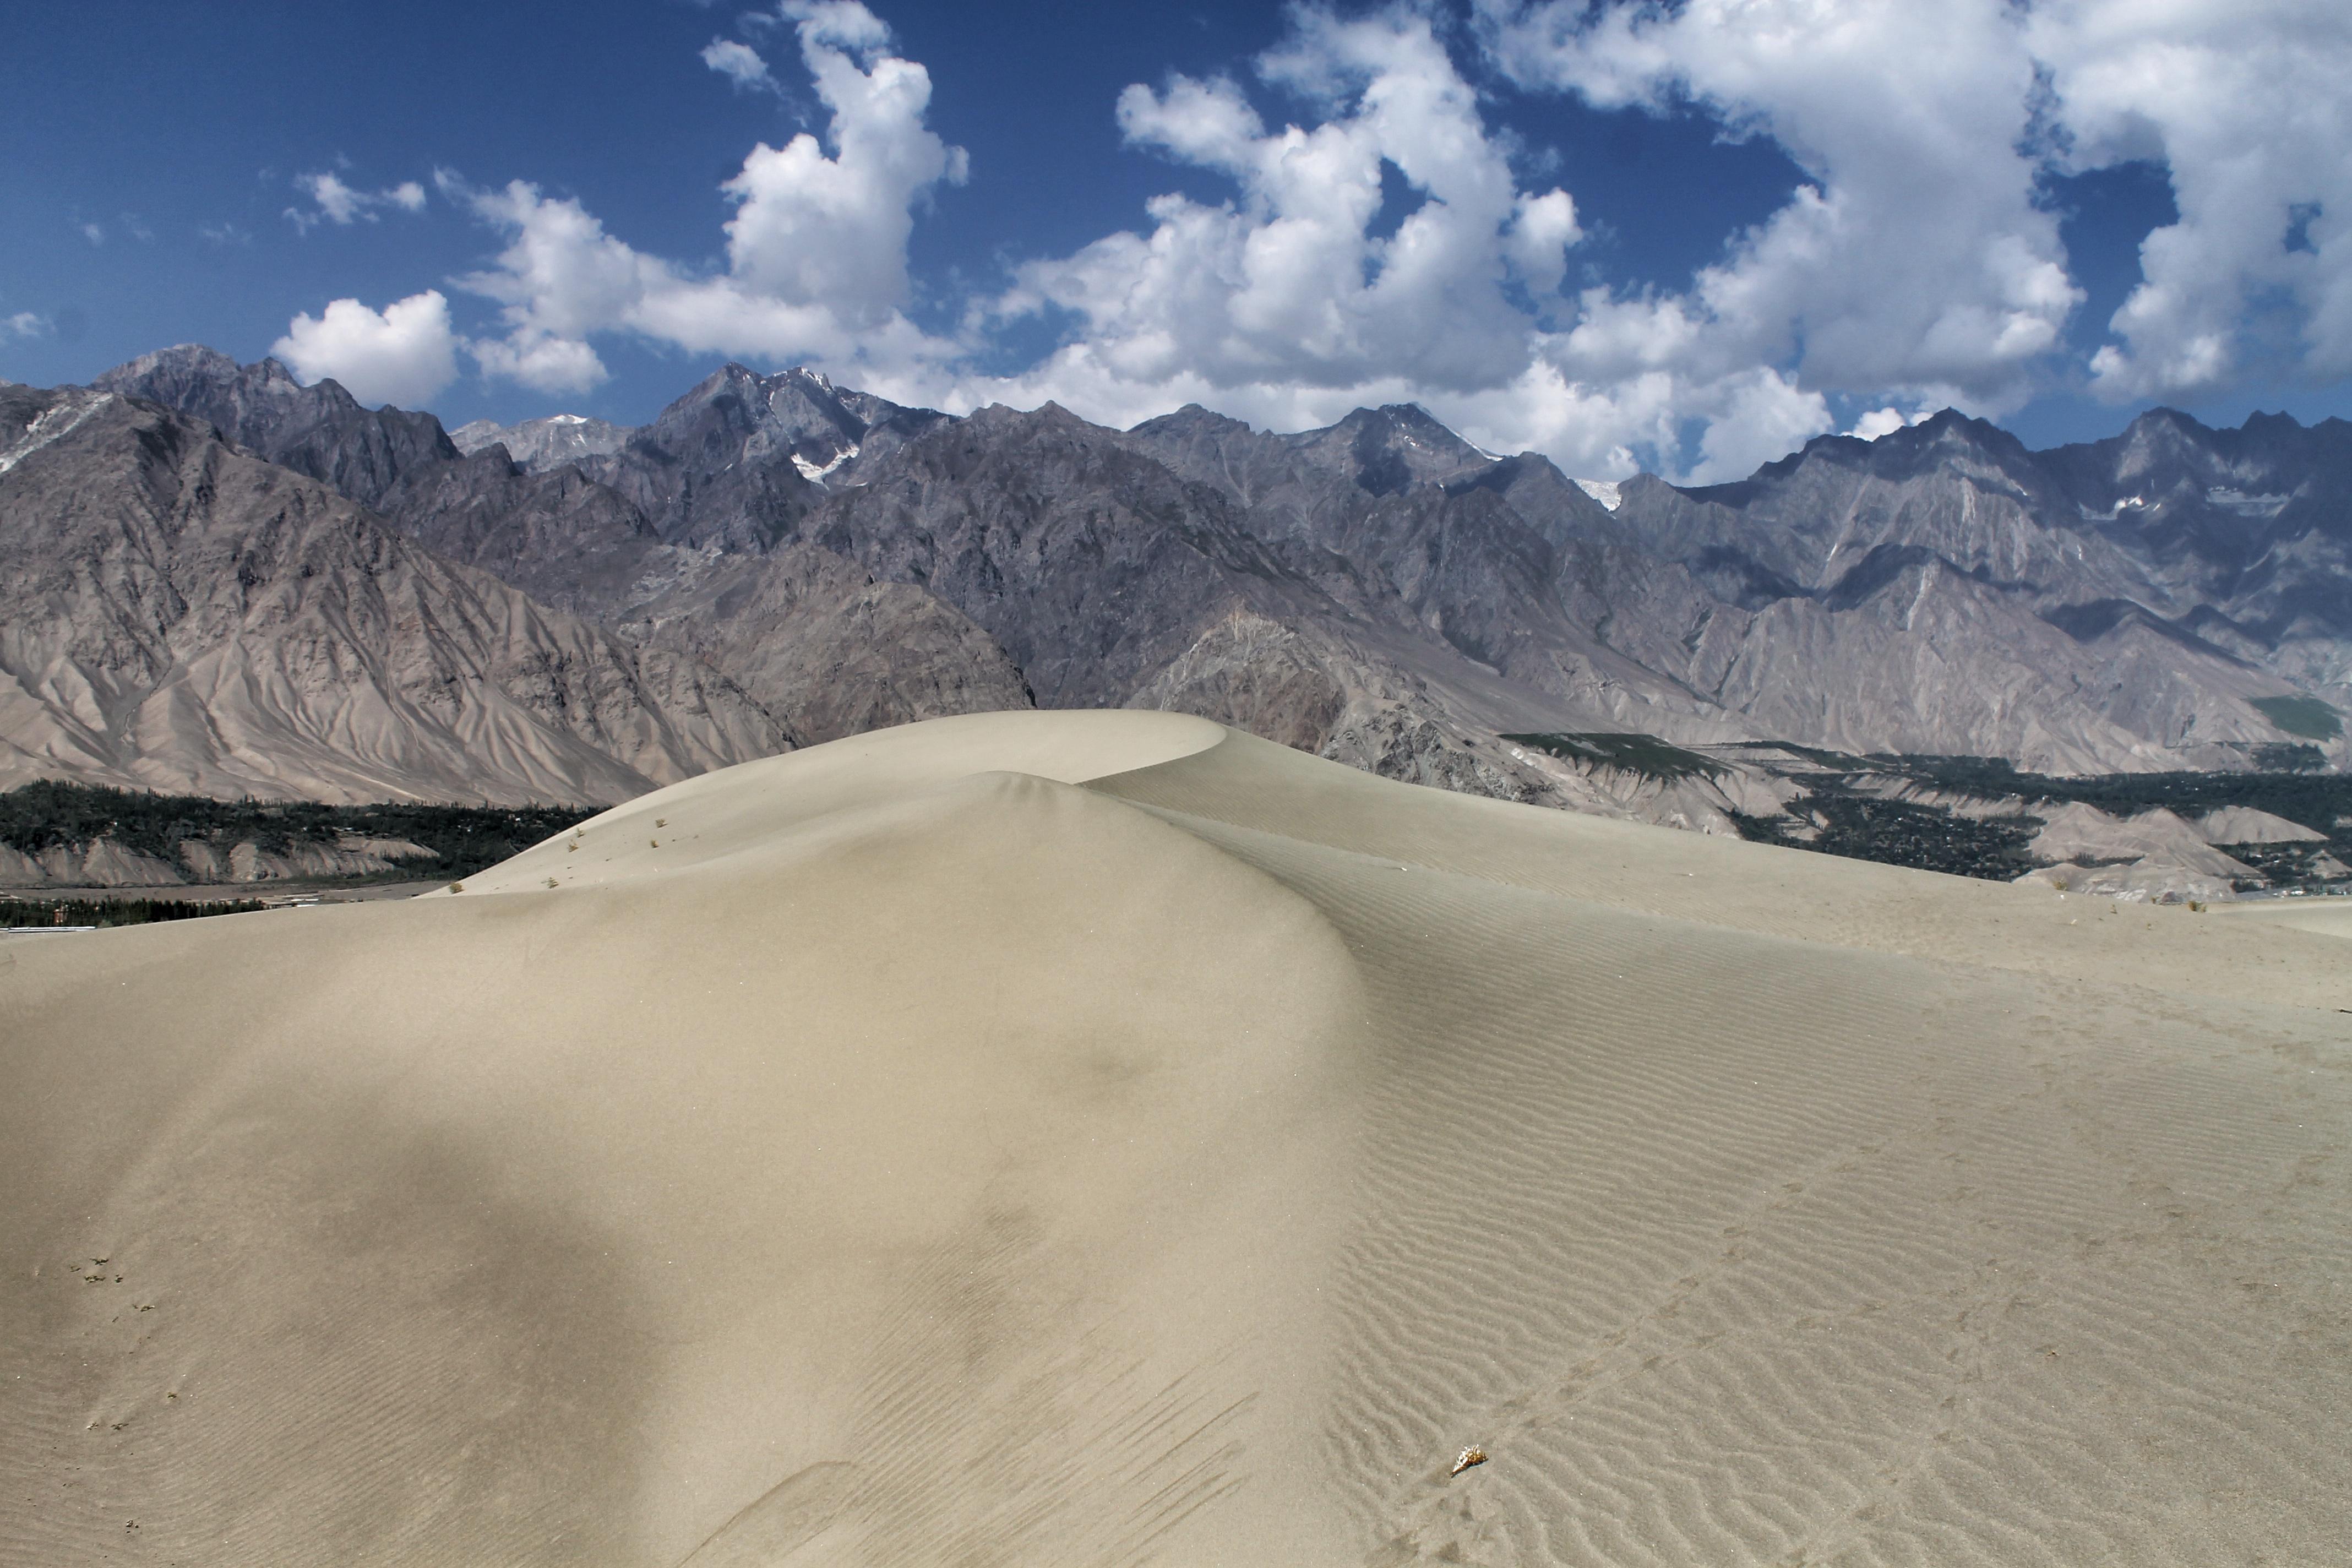 Cold Desert Skardu Photo Credit: Mohammad Waseem (waxeem@gmail.com)